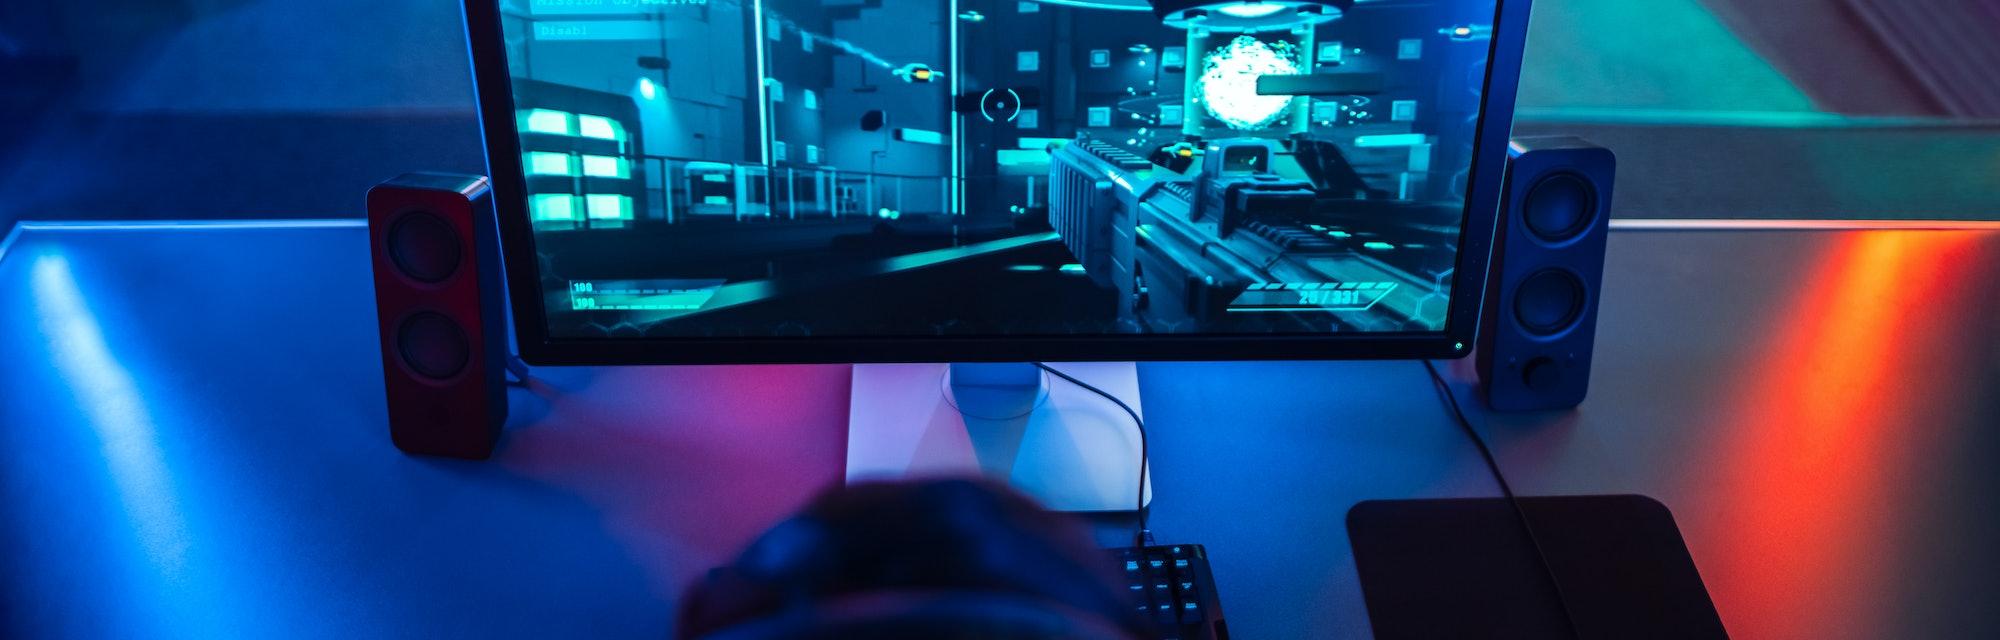 best cheap gaming monitors